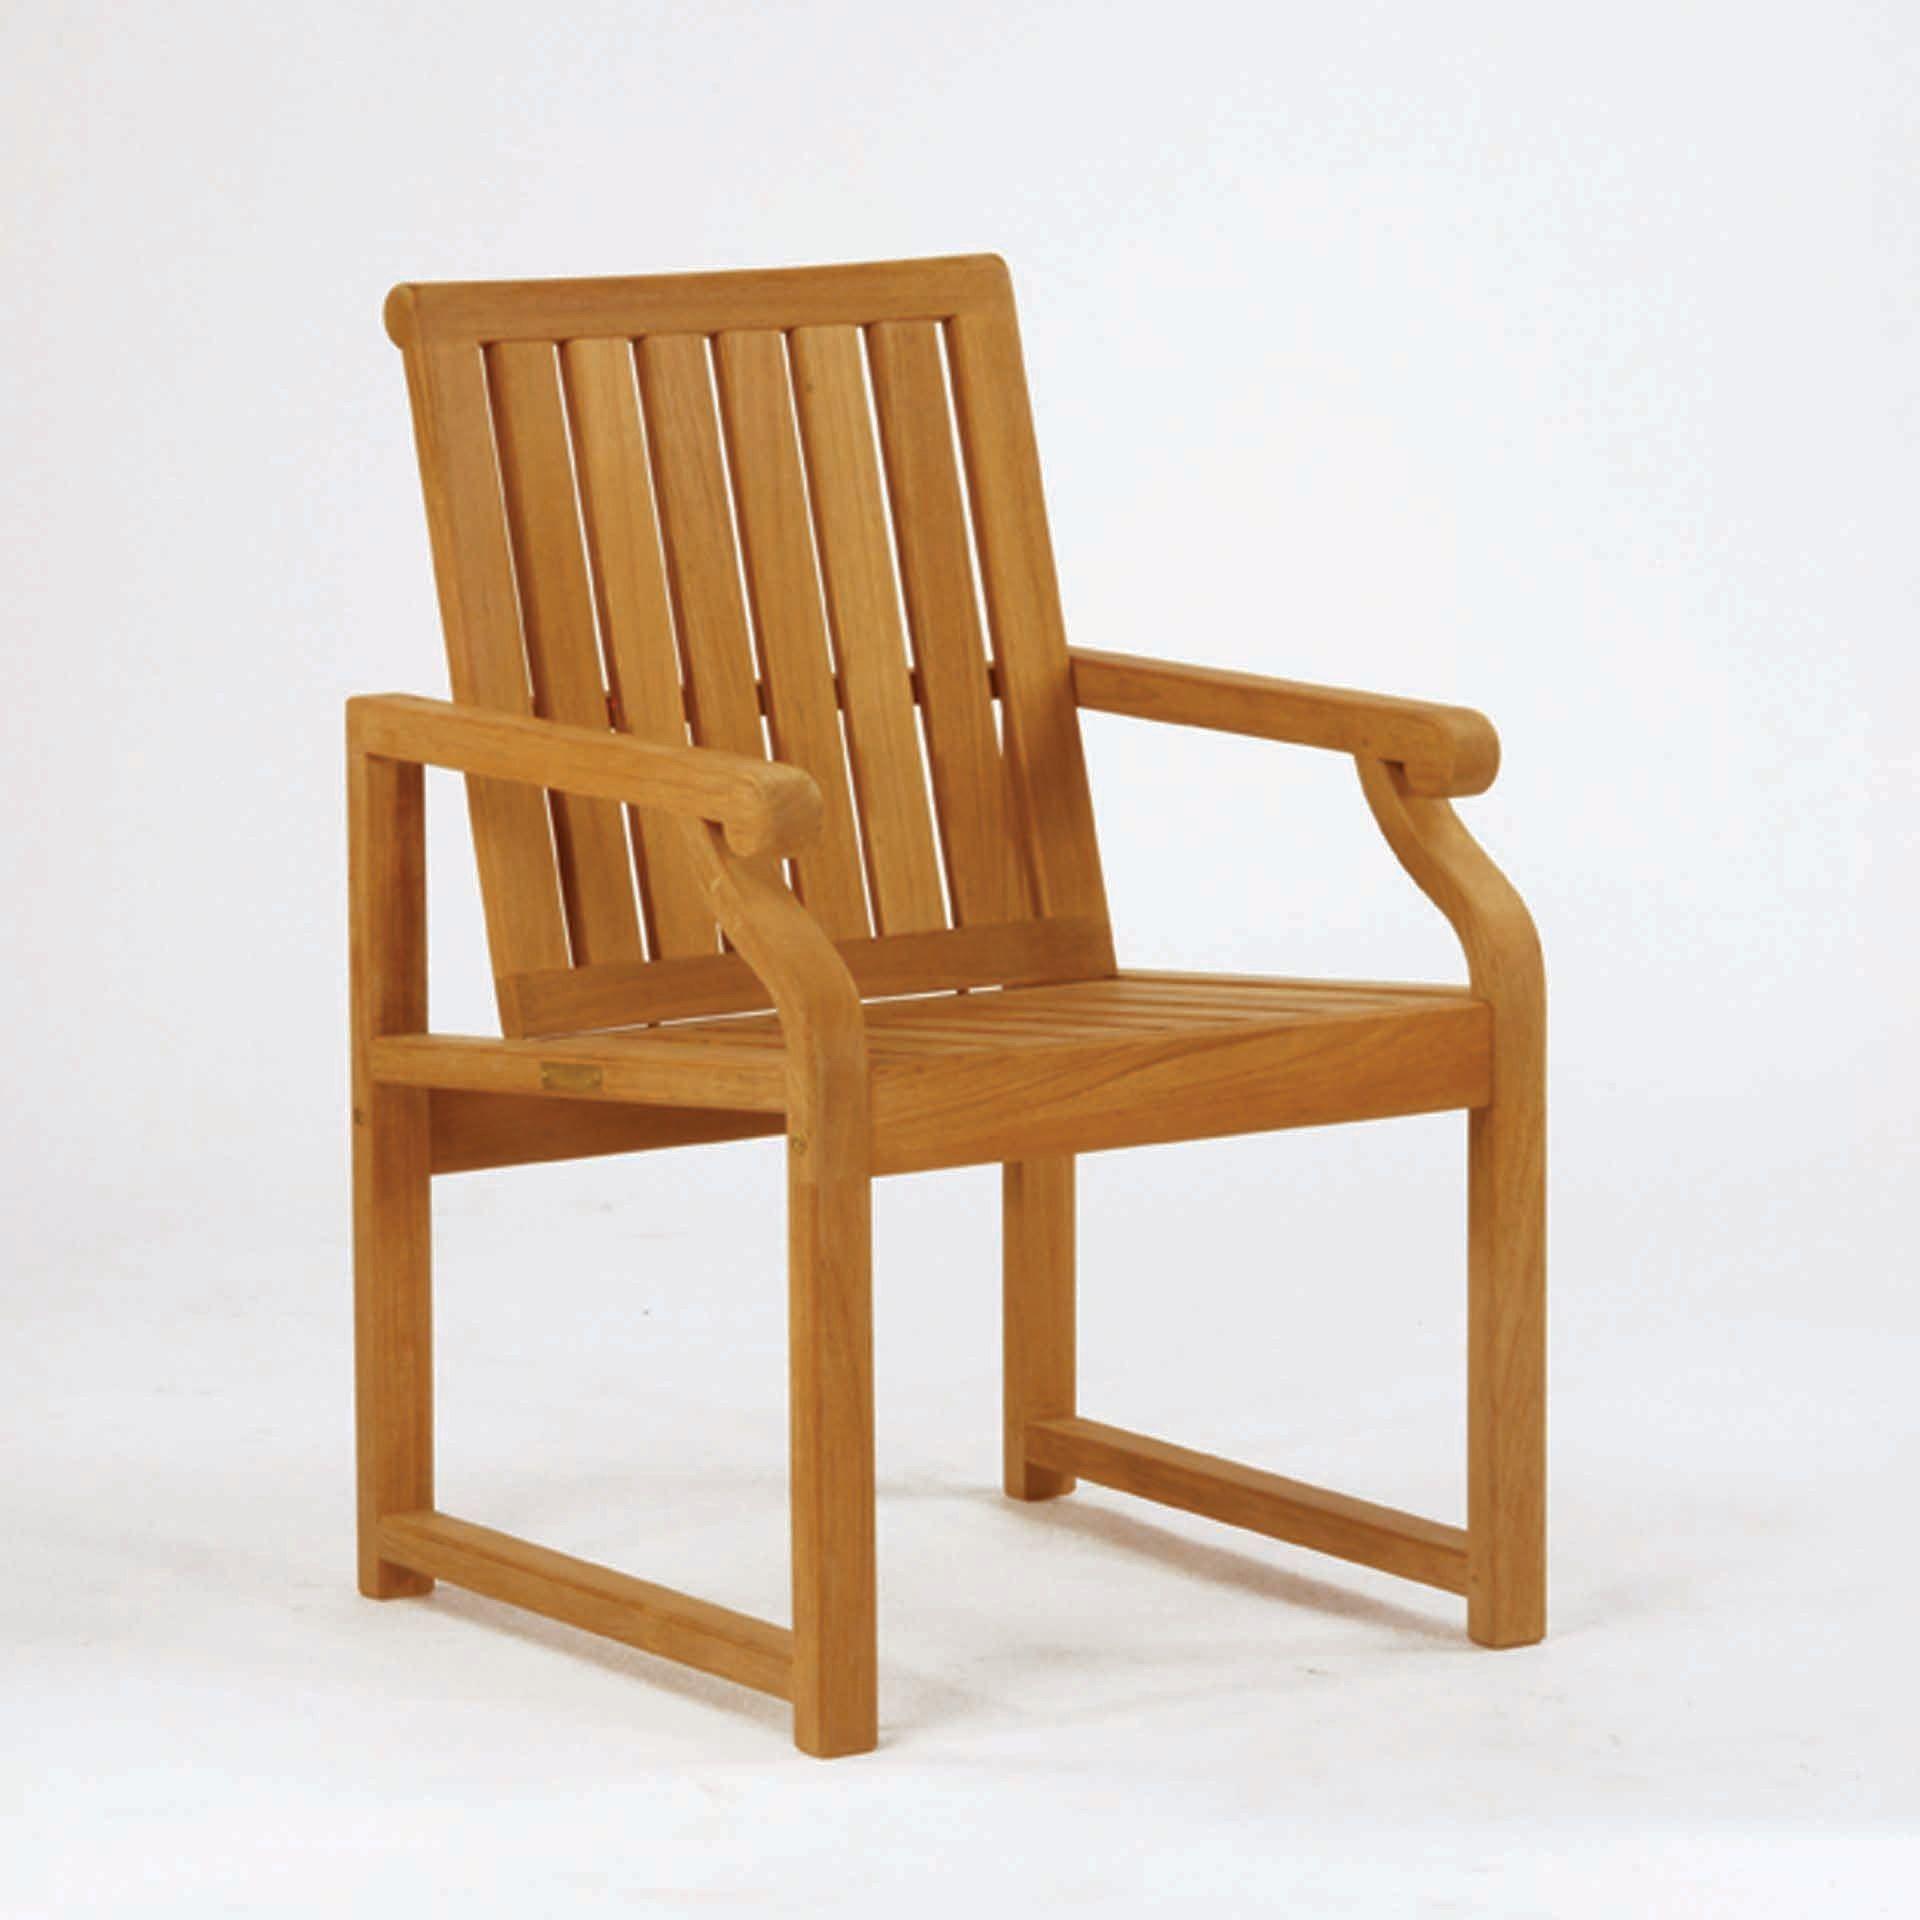 Kingsley Bate Nantucket Dining Arm Chair Leisure Living